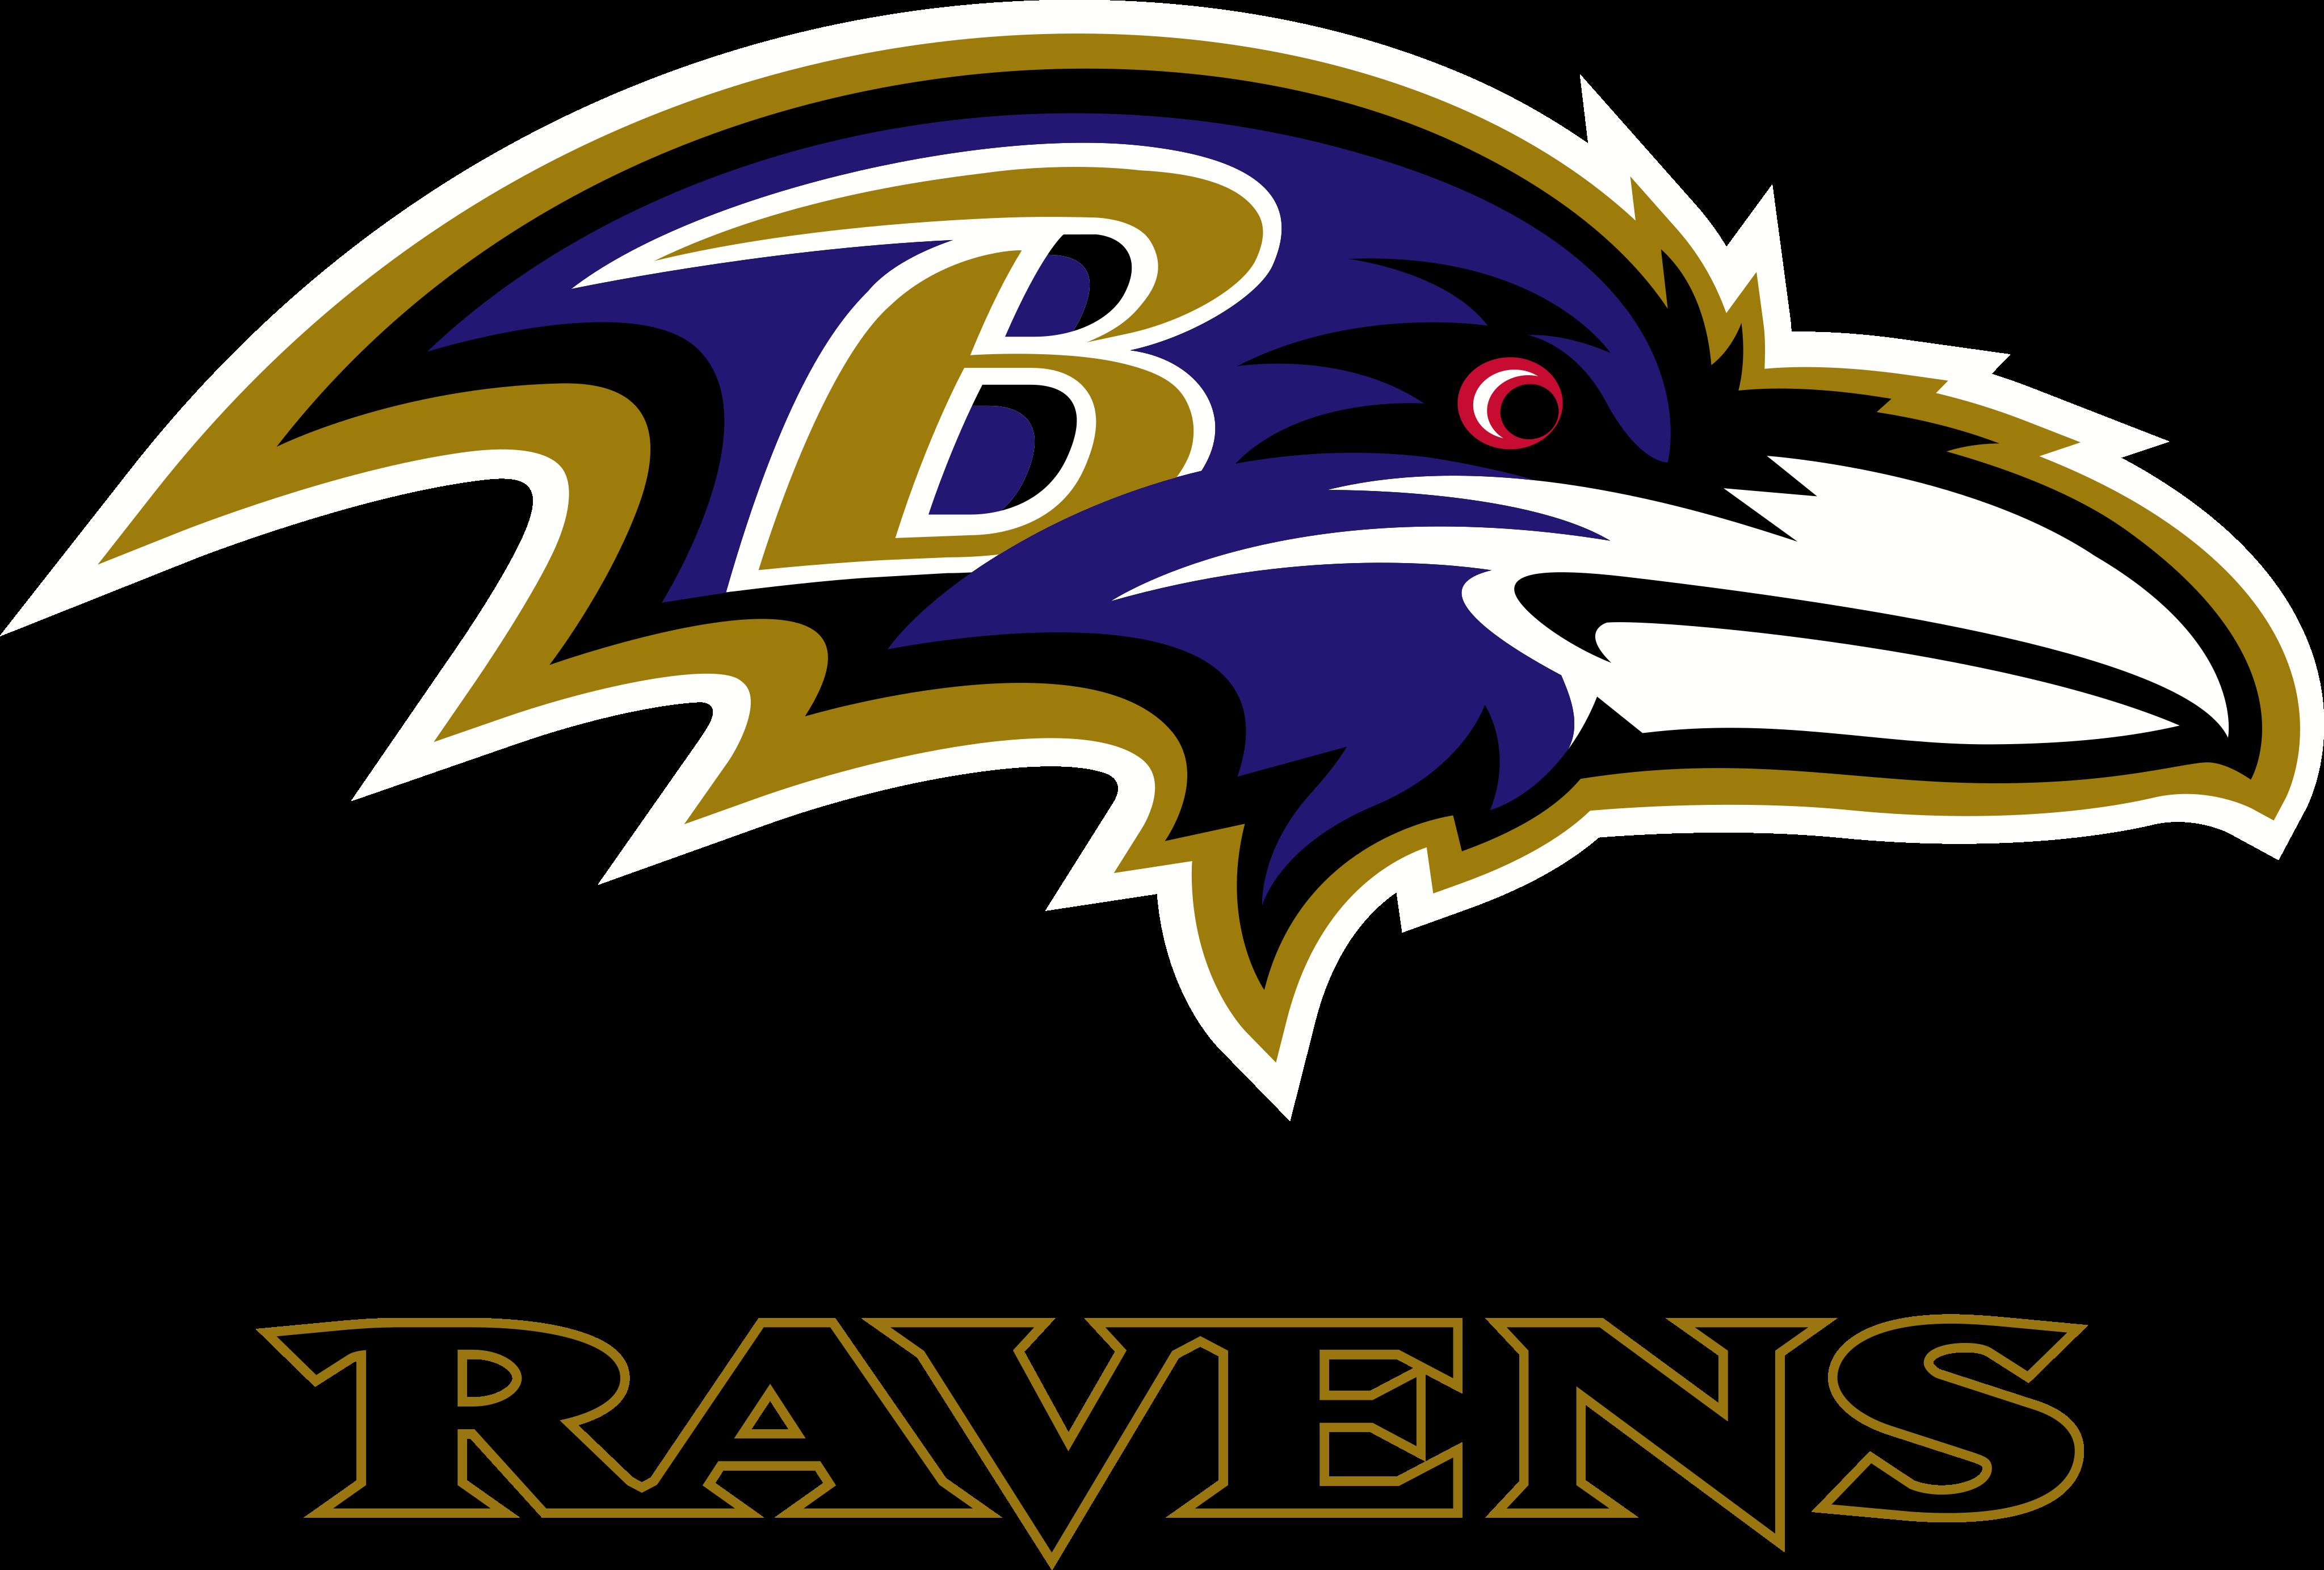 baltimore ravens logo 1 - Baltimore Ravens Logo